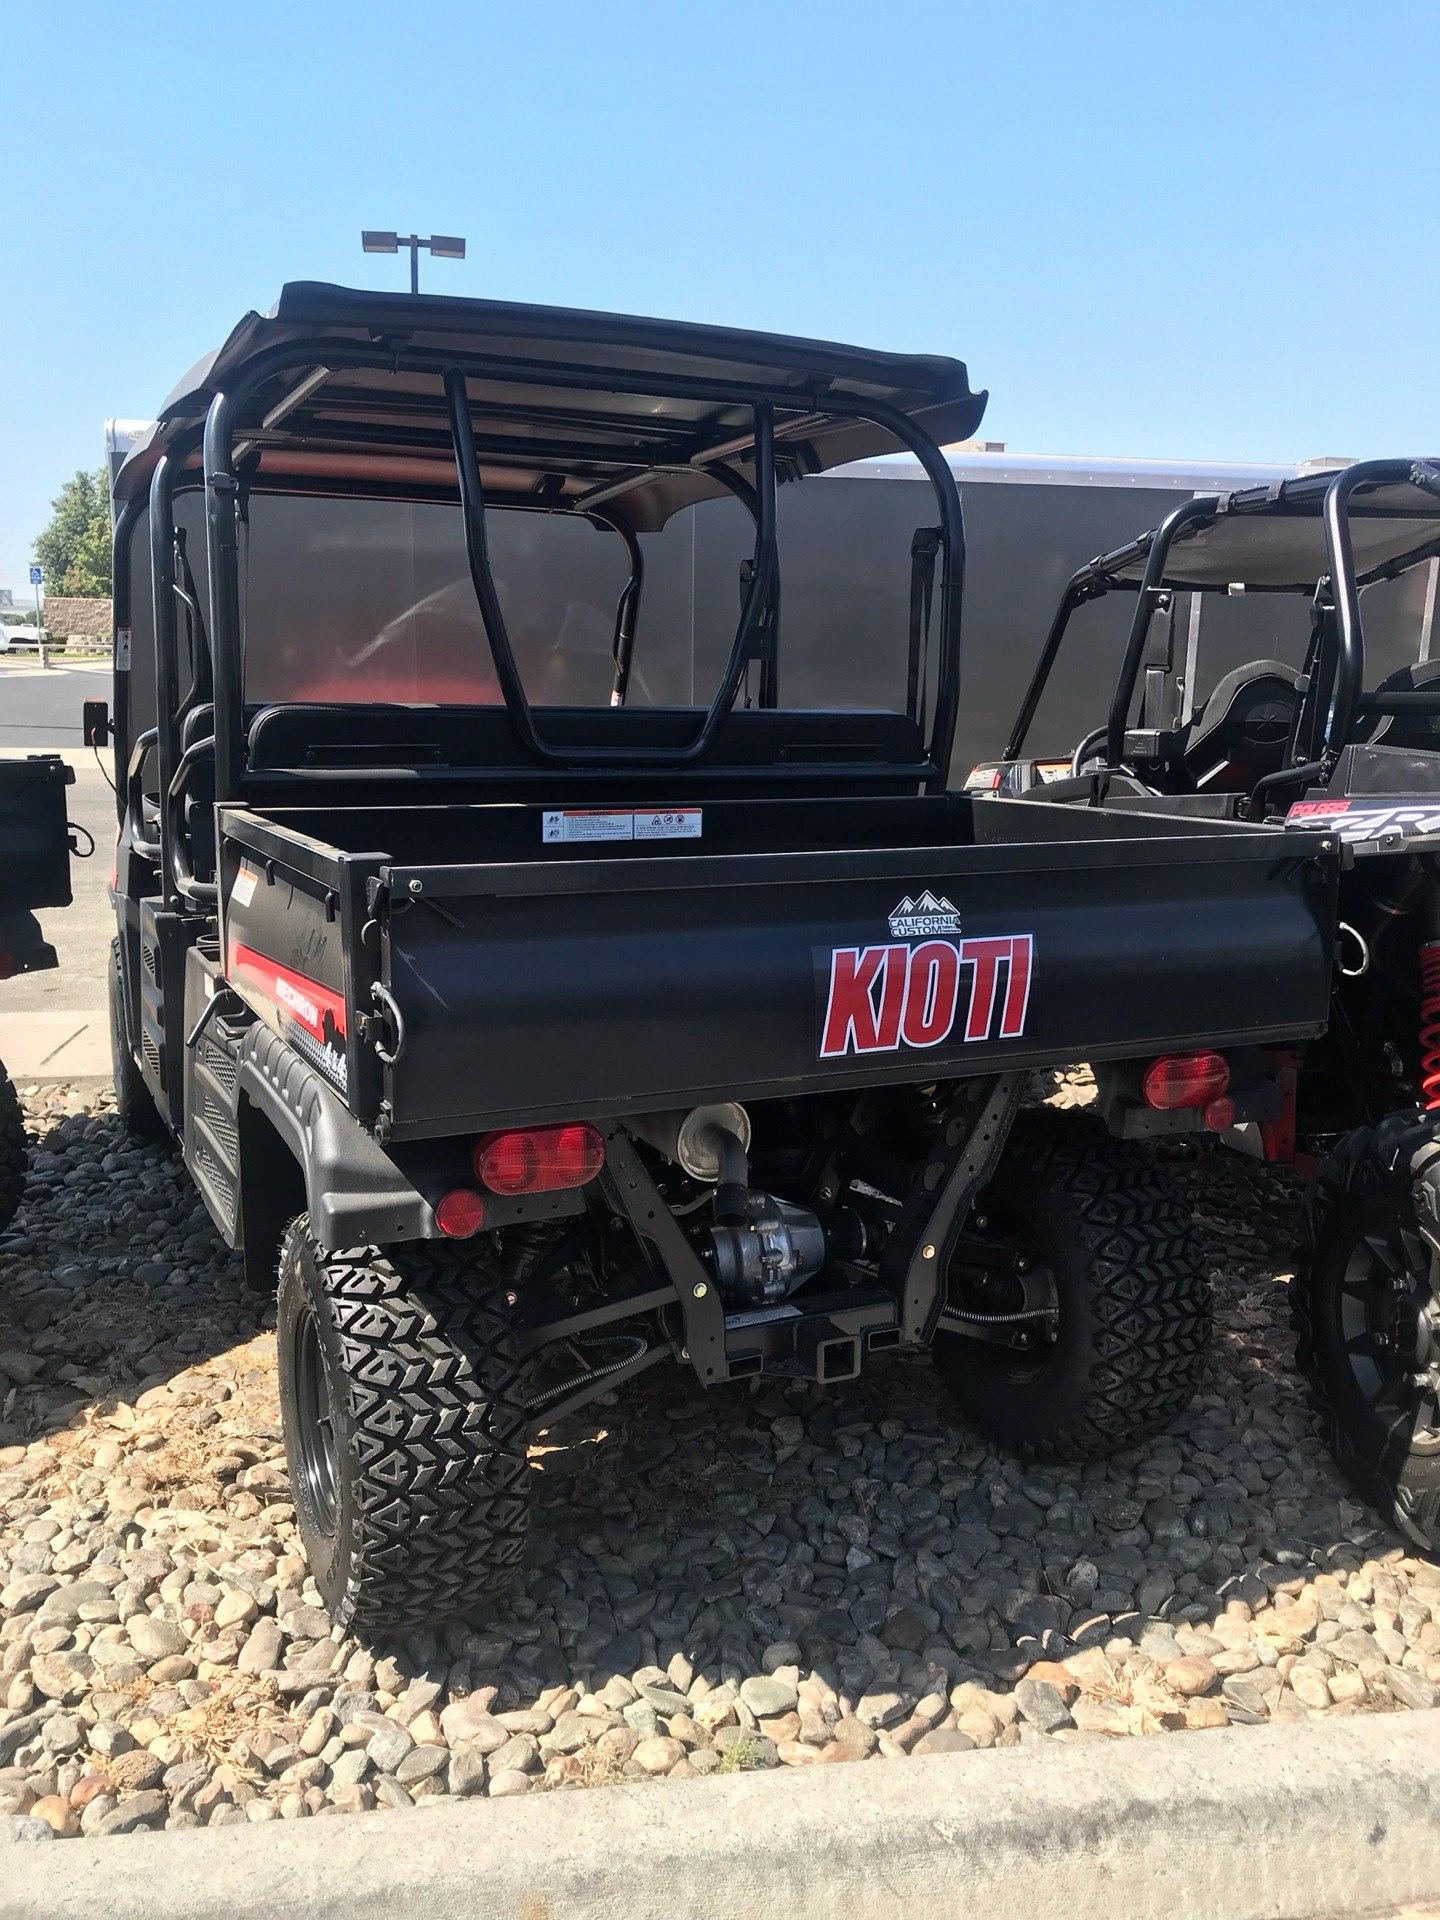 2018 KIOTI MECHRON 2240 in Elk Grove, California